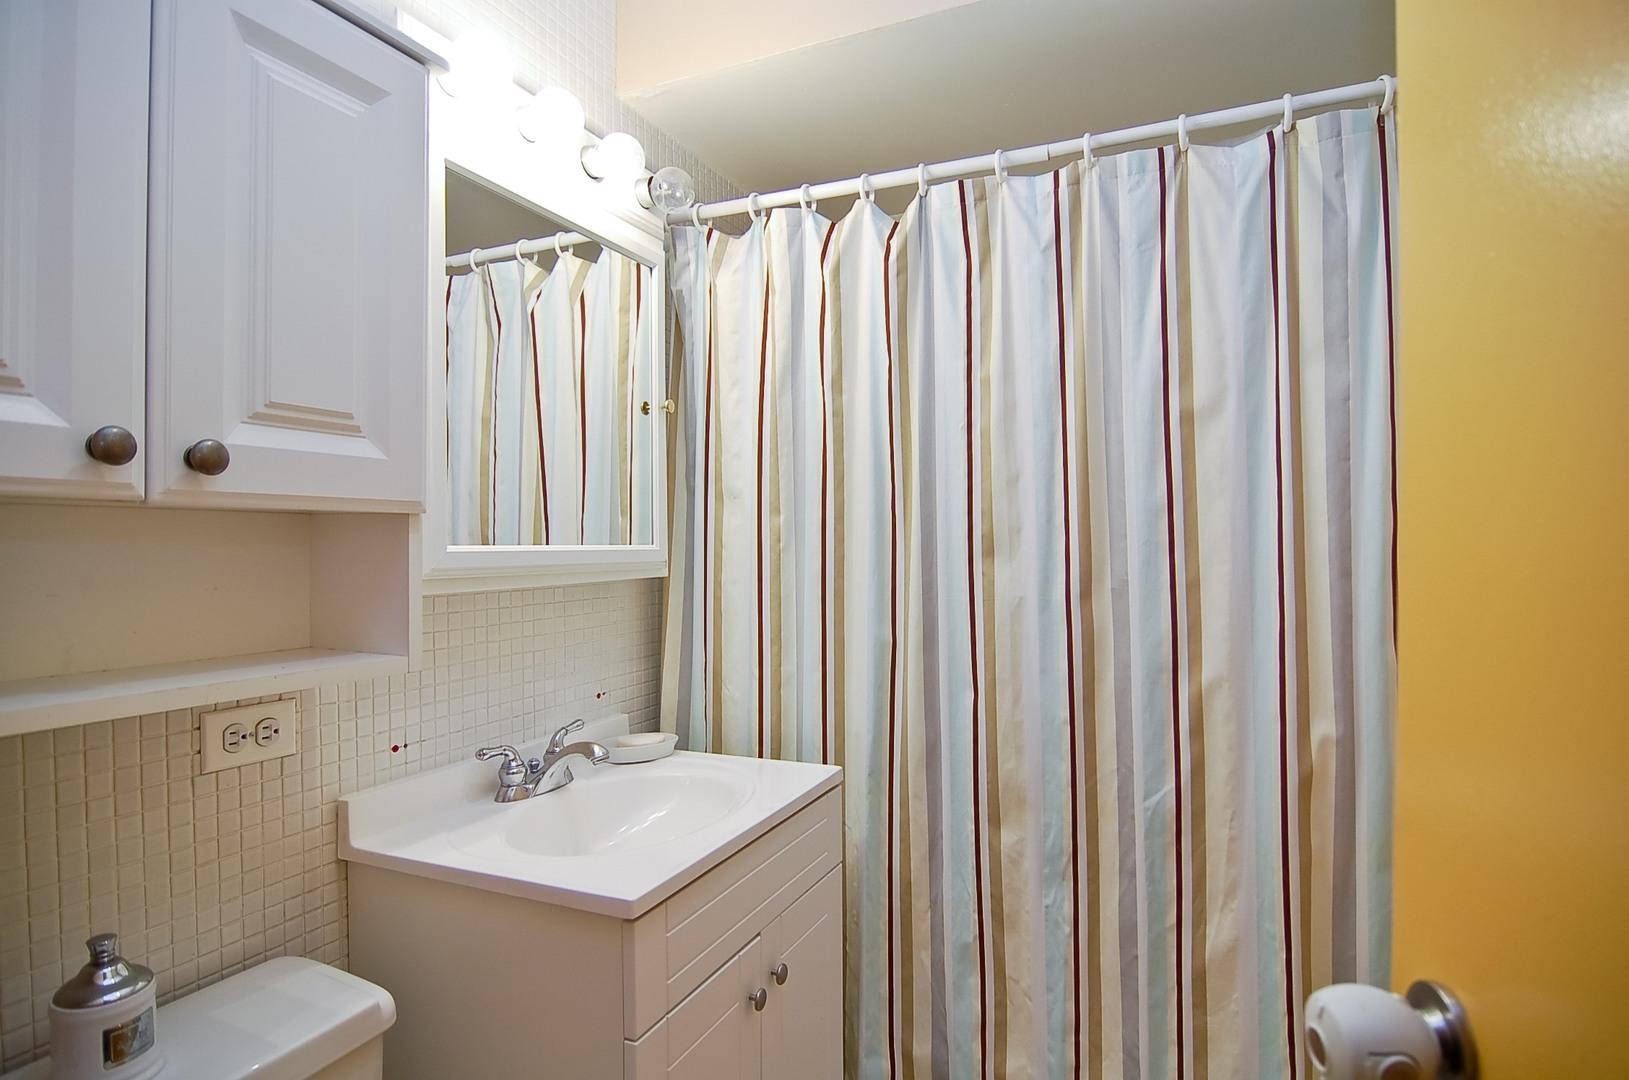 Hd 1497289658837 08 2626nlakeview unit301 13 masterbathroom hires